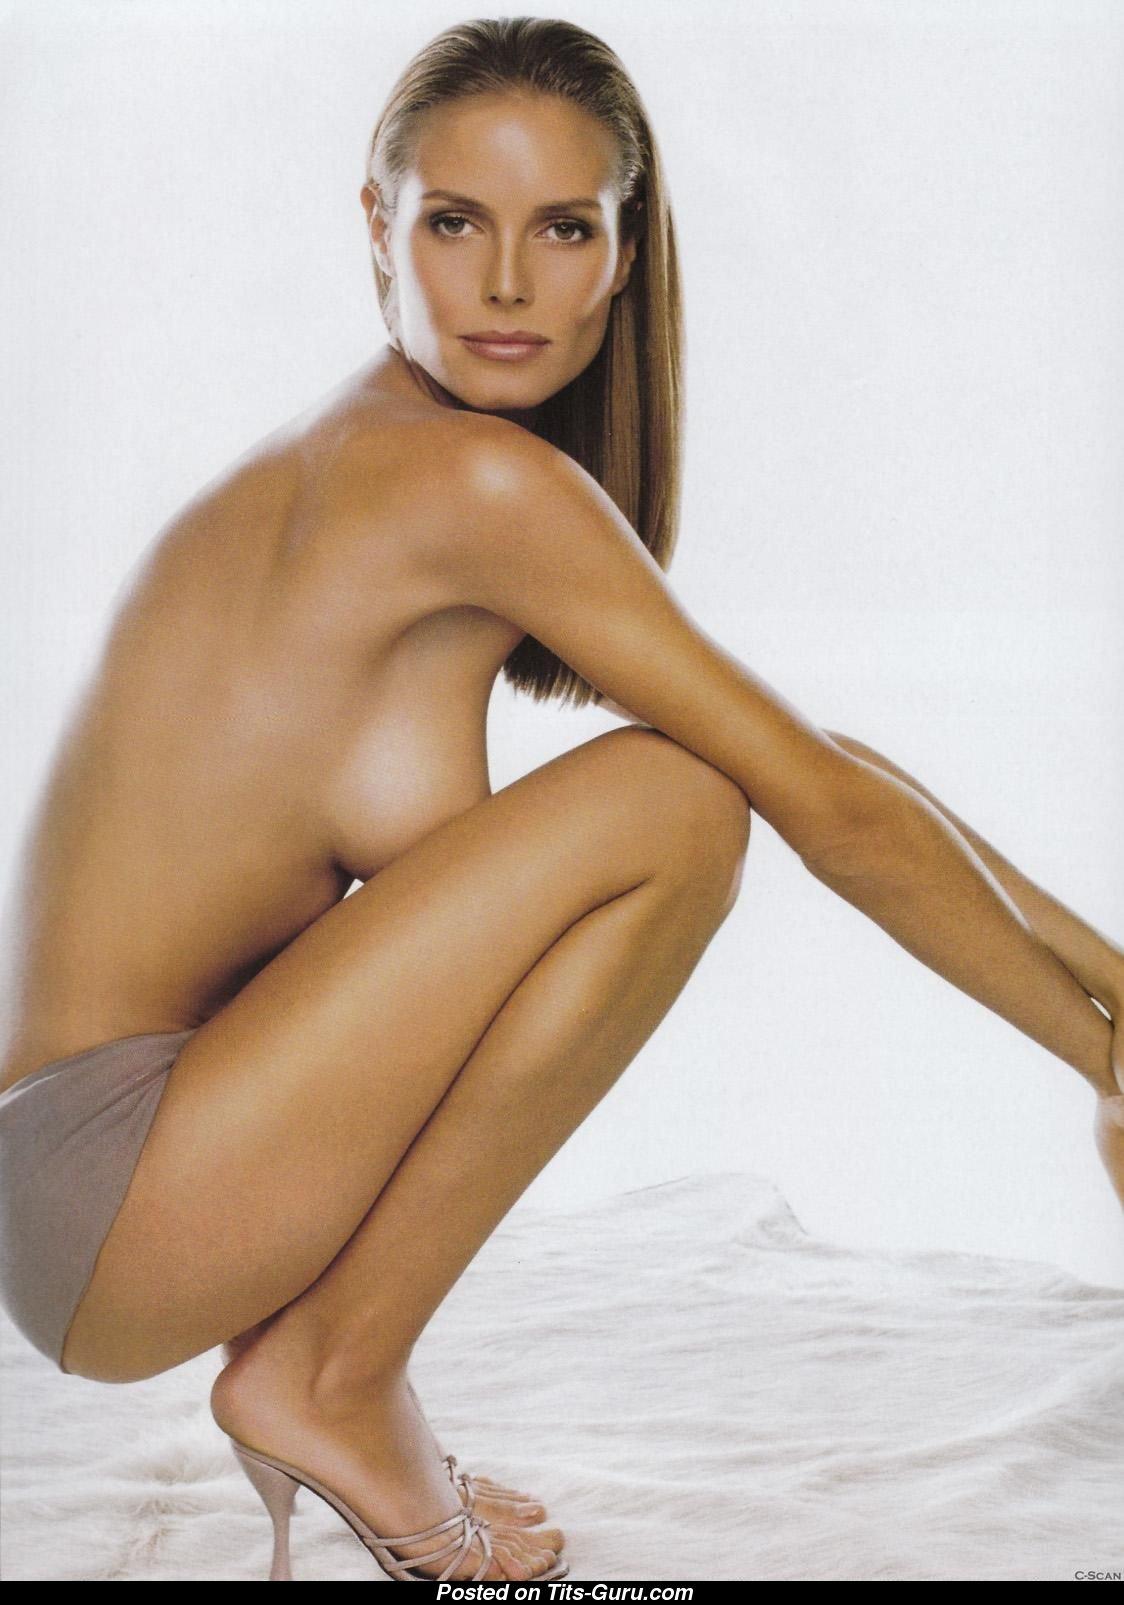 Heidi Klum Sexy Nude Amazing Woman Image